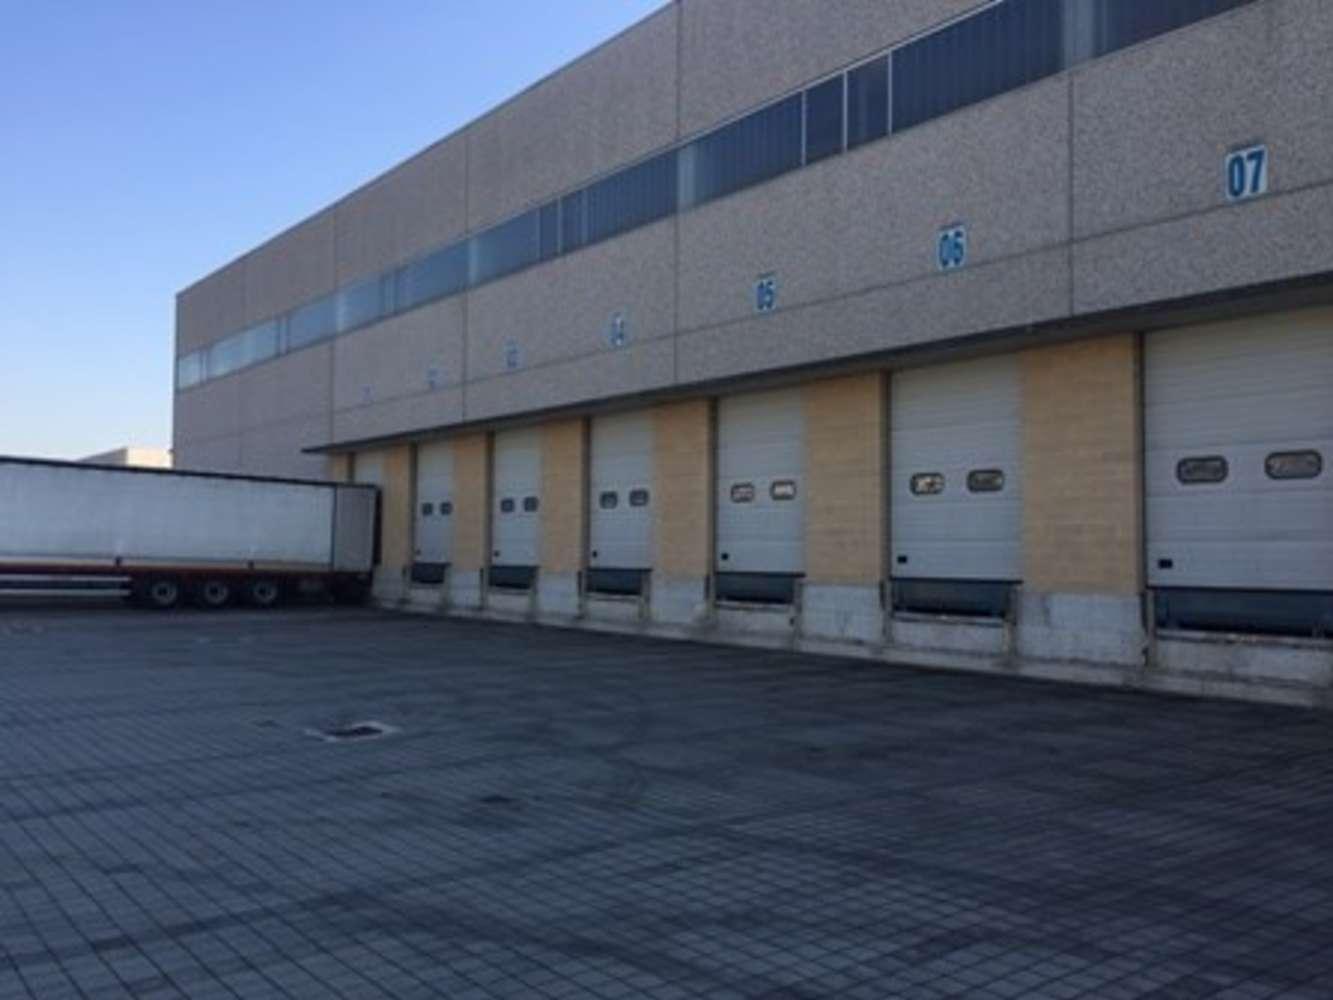 Magazzini industriali e logistici Telgate, 24060 - Telgate Warehouse - 8960879